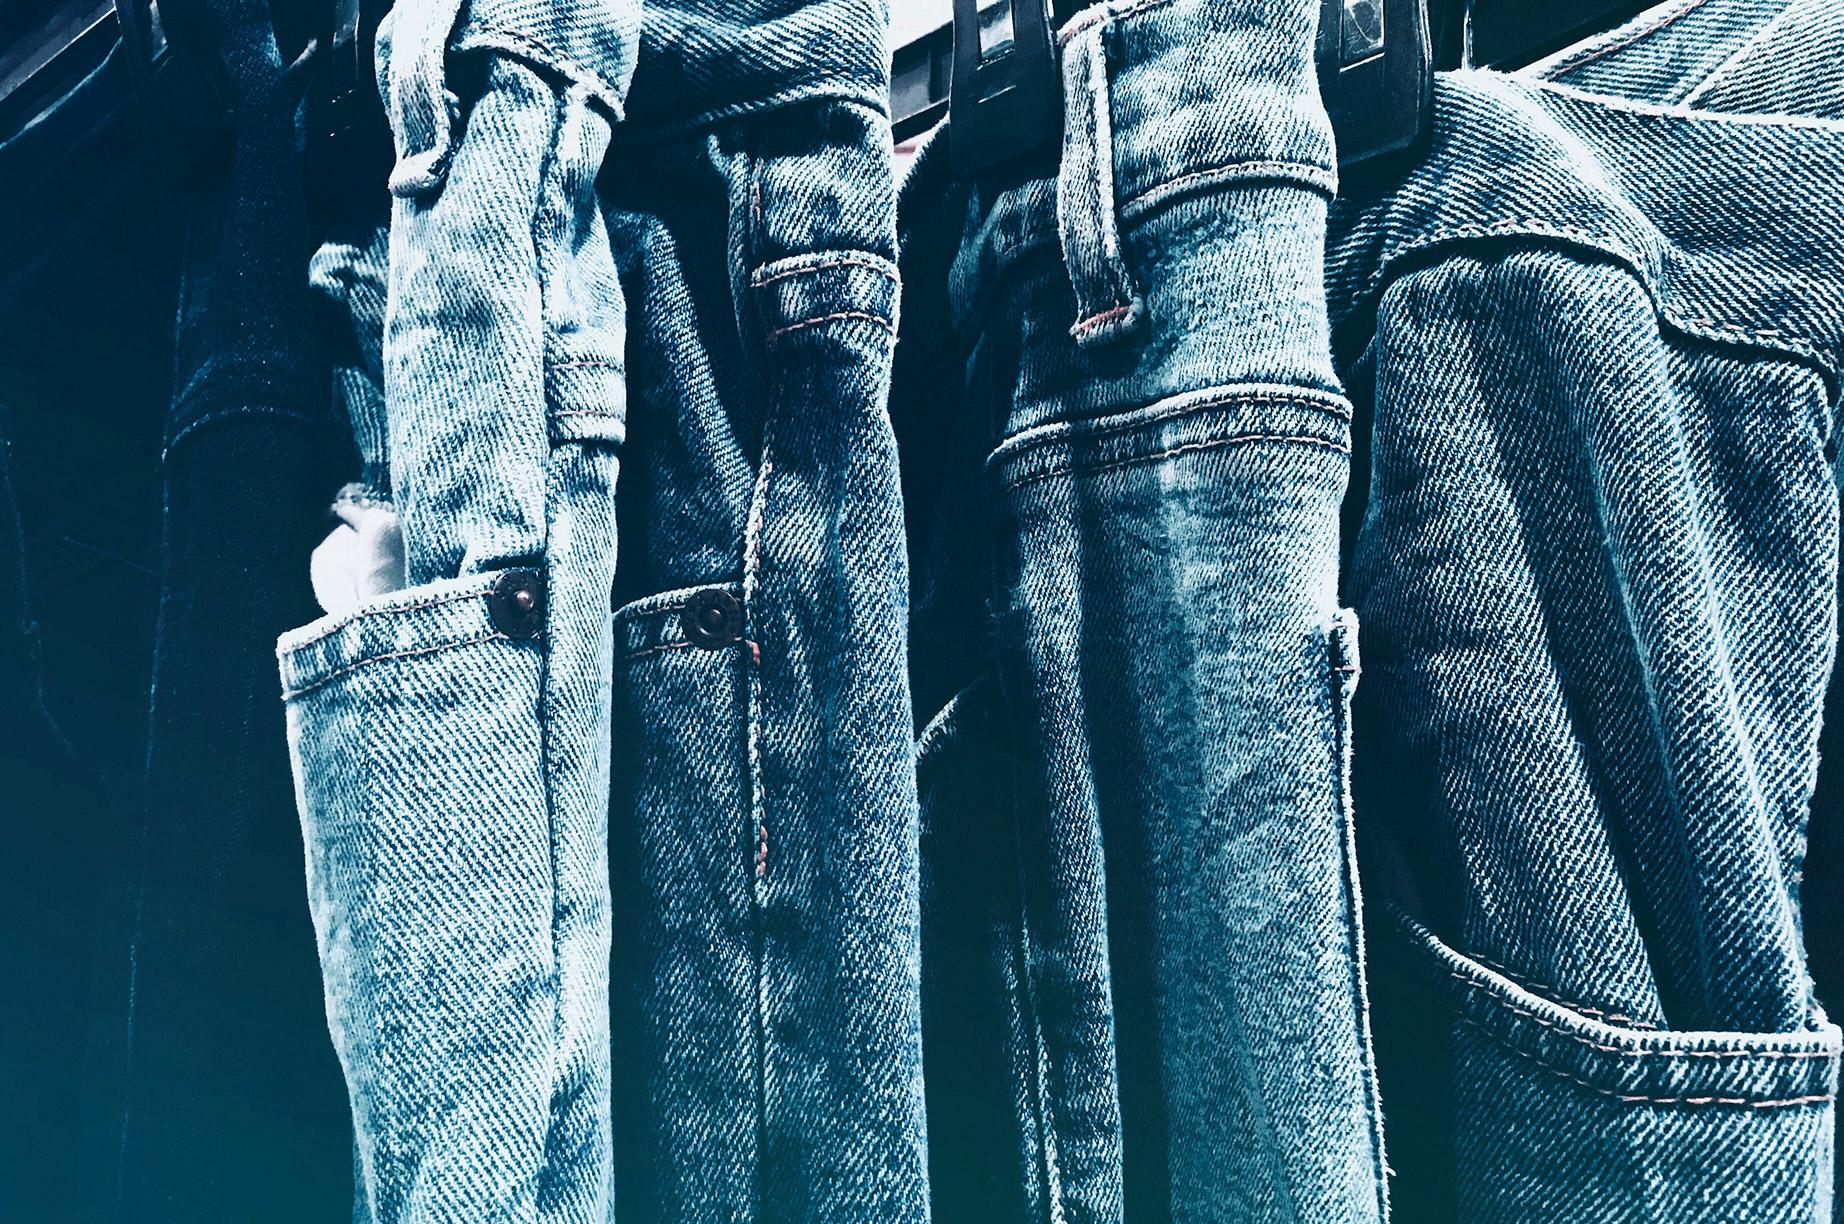 Estilo jeanswear se popularizar nas telas de cinema e comerciais de TV